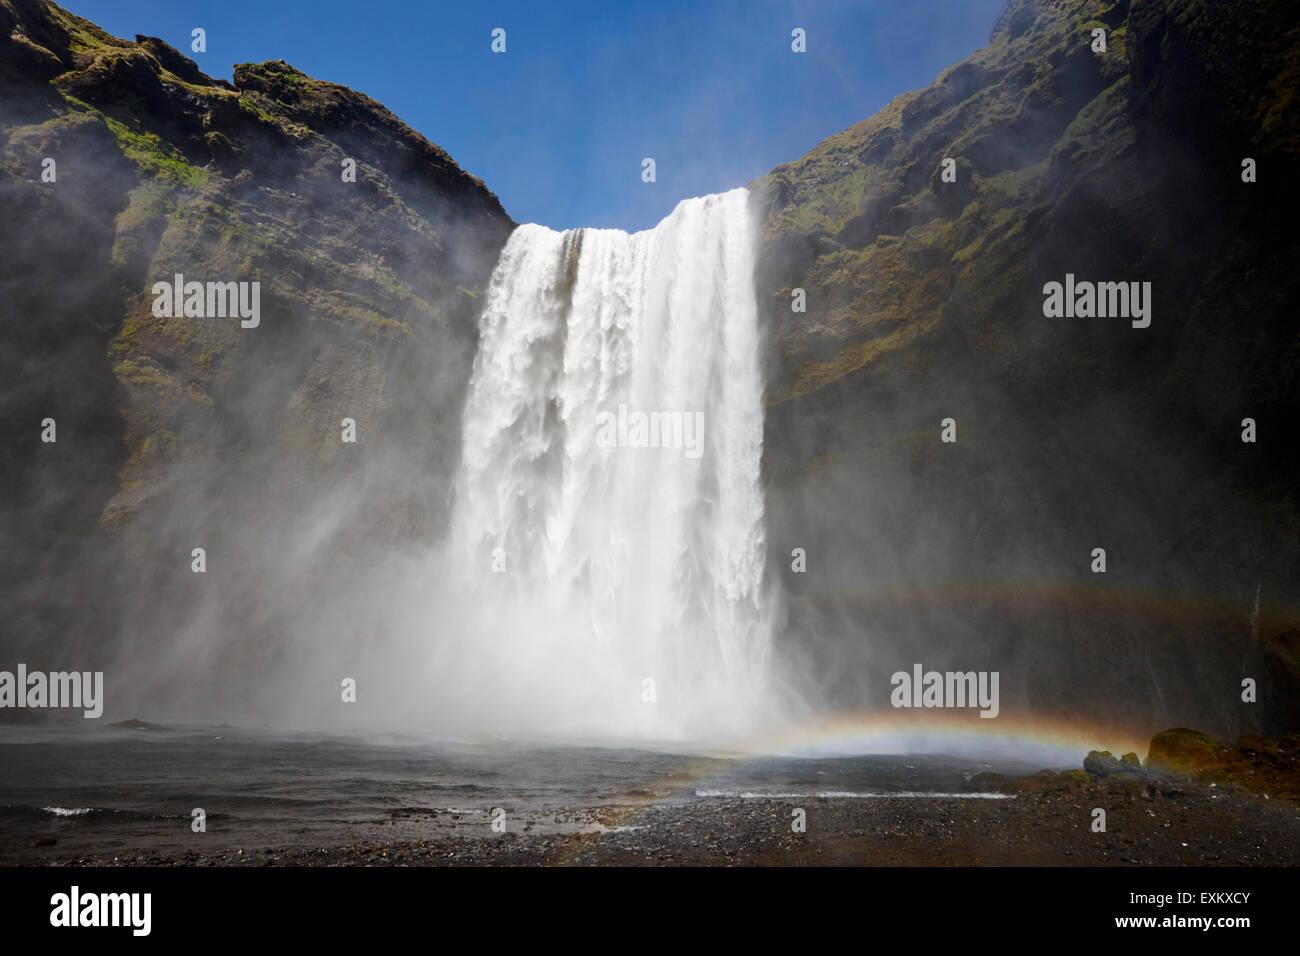 doppelter Regenbogen am Skogafoss Wasserfall in Island Stockbild